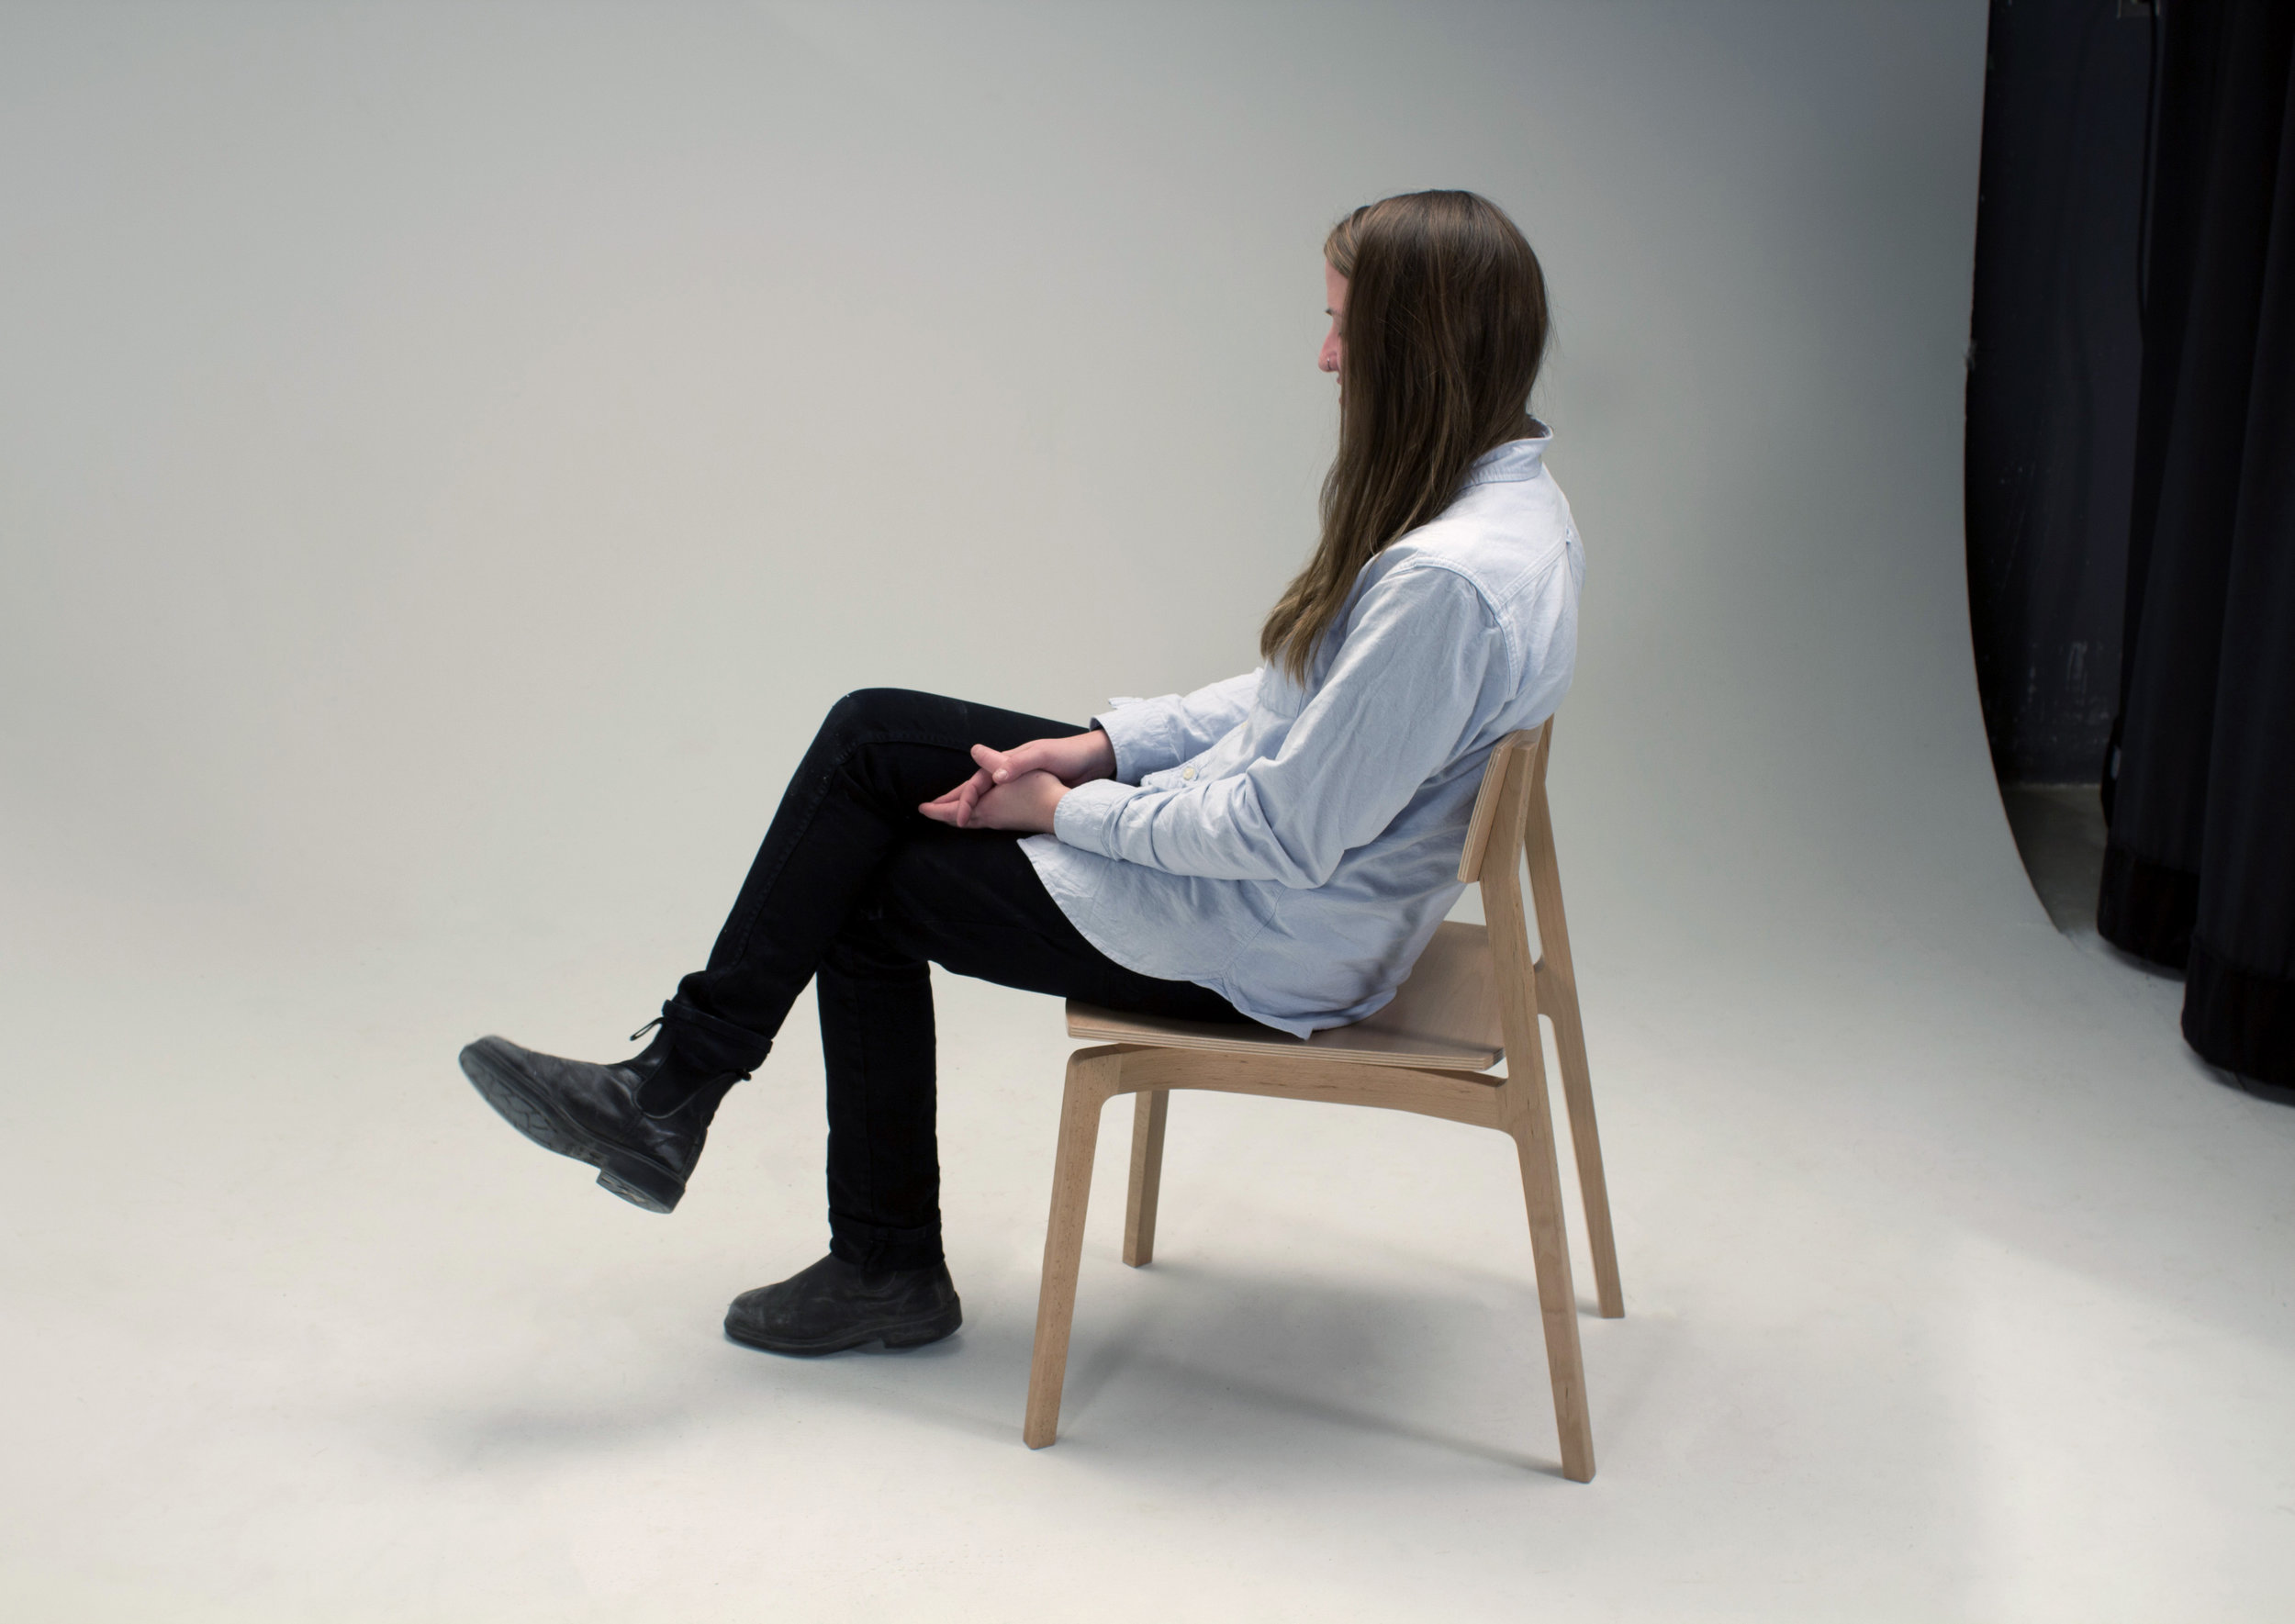 Allsun_Campbell_Furniture_Designer_Product_Designer.jpg